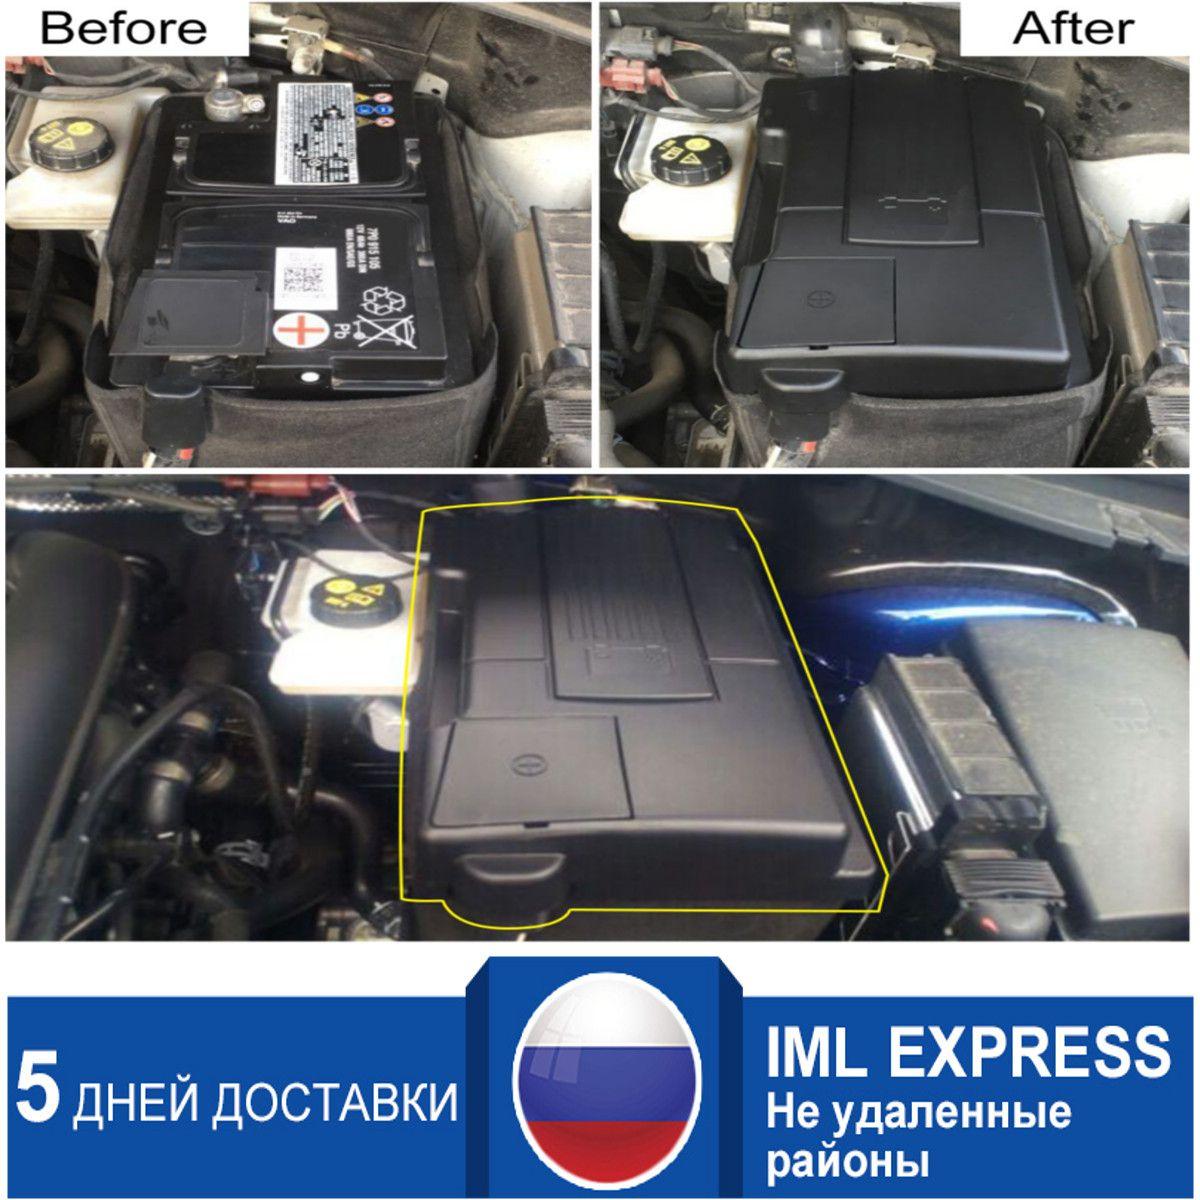 Für Skoda Kodiaq Octavia 5E (A7) für VW Tiguan L 16-2018 Motor Batterie Staubdicht Negative Elektrode Wasserdichte Schutzhülle